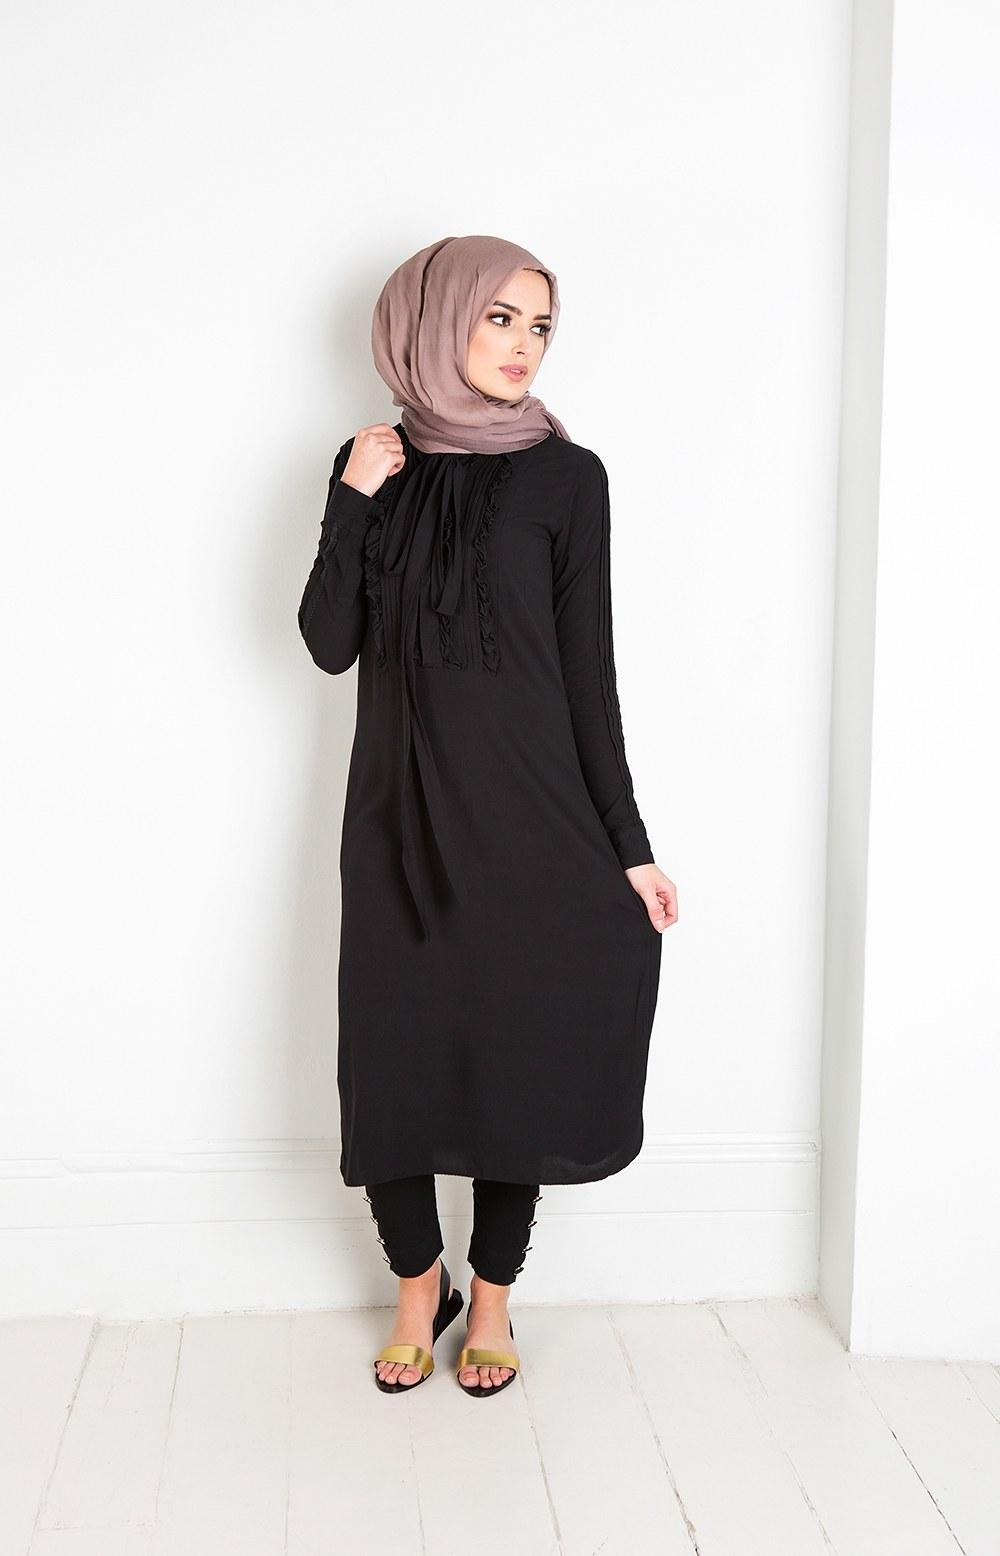 Model Foto Model Baju Lebaran 2018 9ddf 25 Trend Model Baju Muslim Lebaran 2018 Simple & Modis